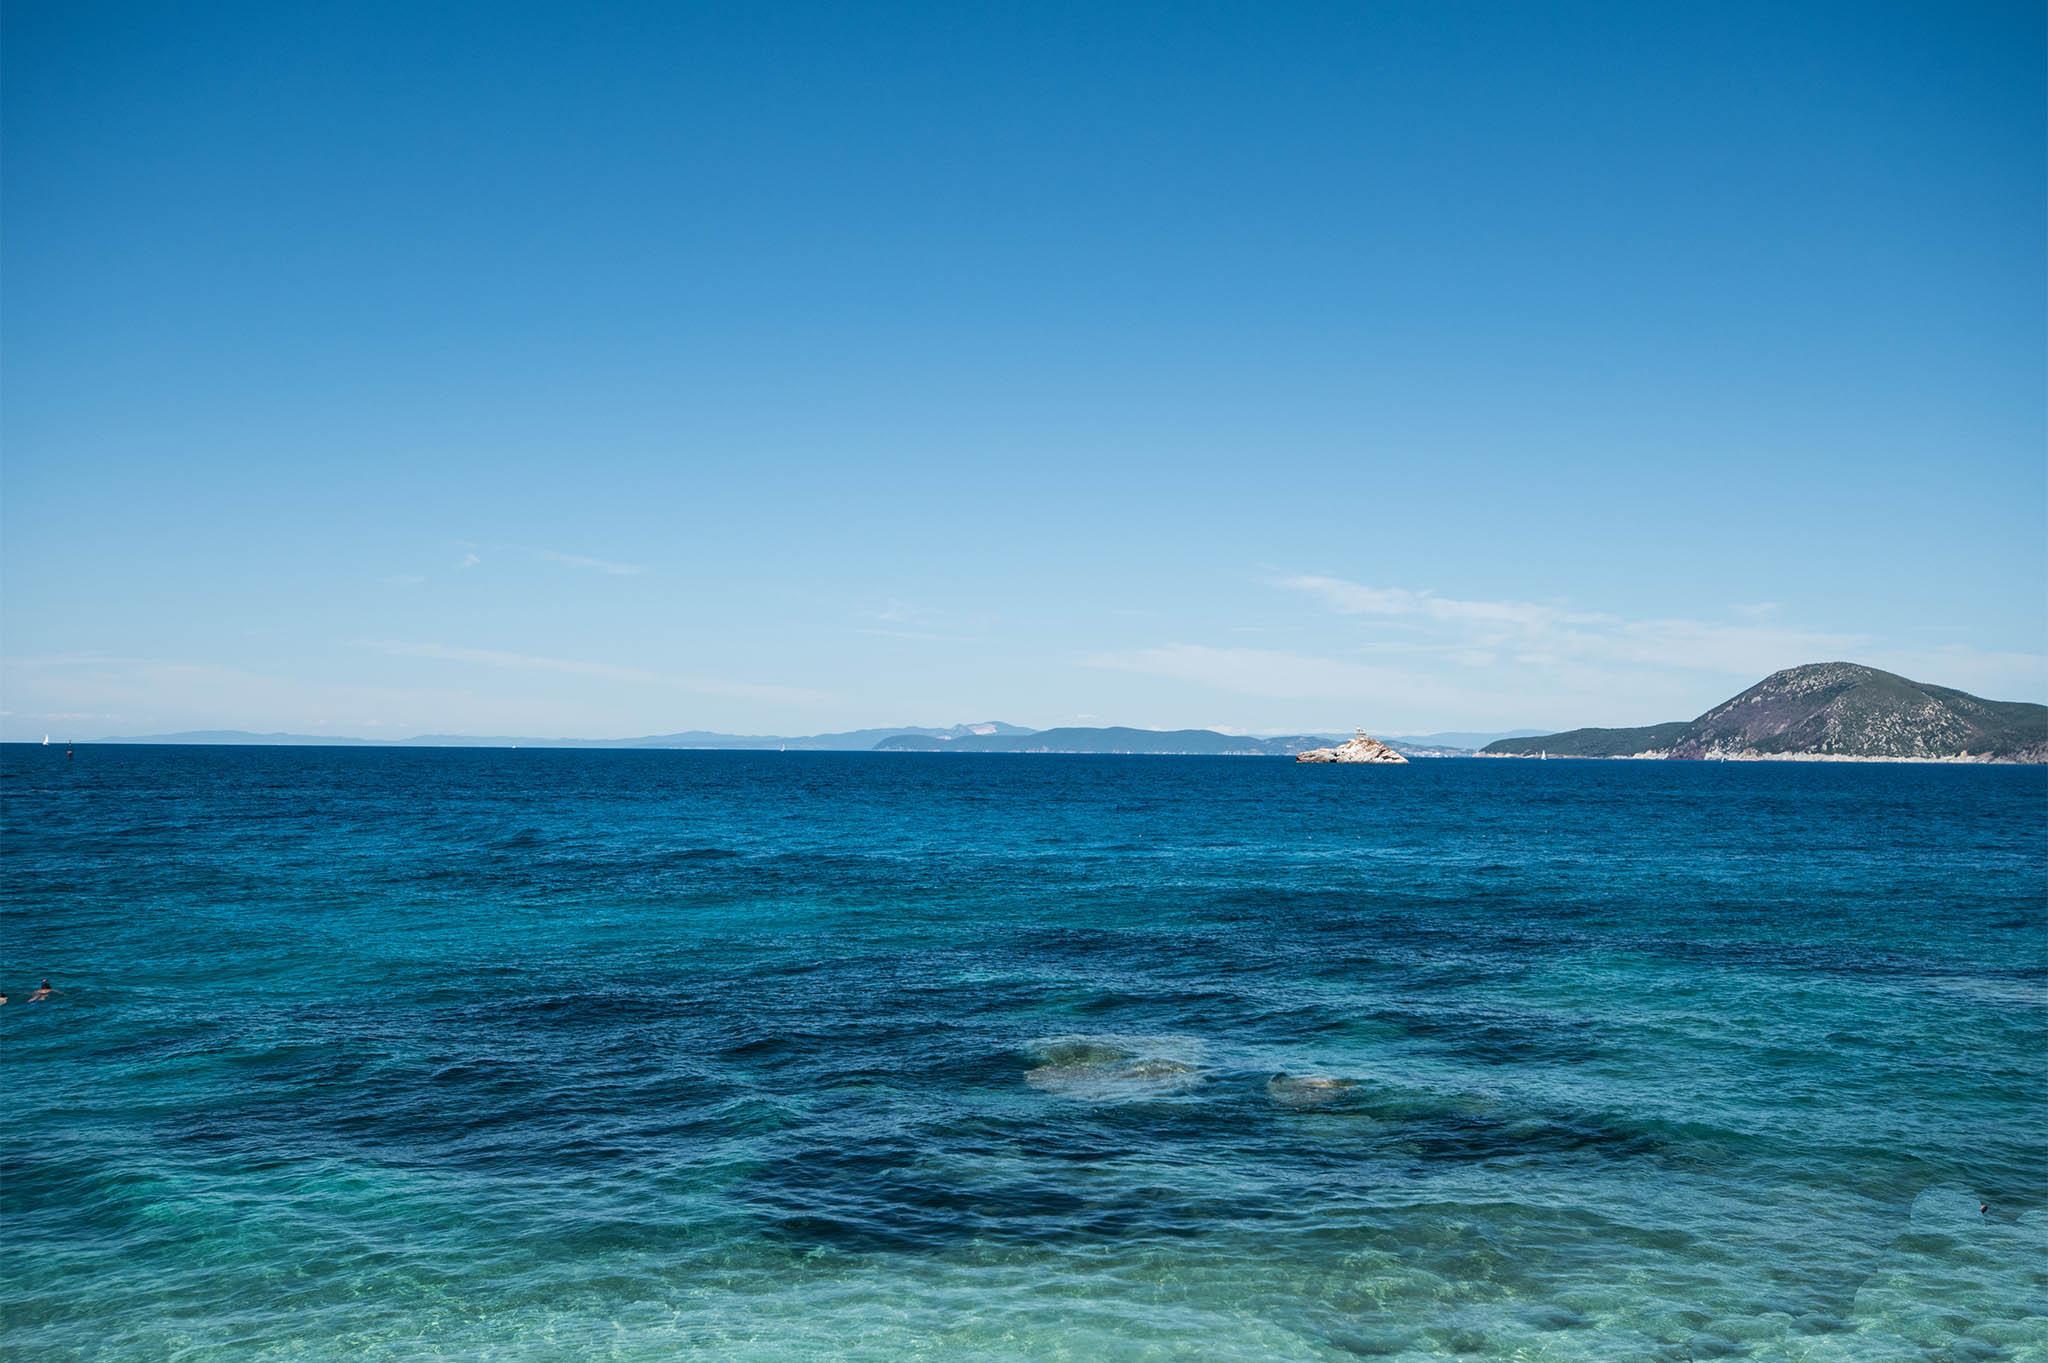 Immobilien Elba: Villen und haus kaufen Elba | Sotheby's Realty - sothebys.photo 1